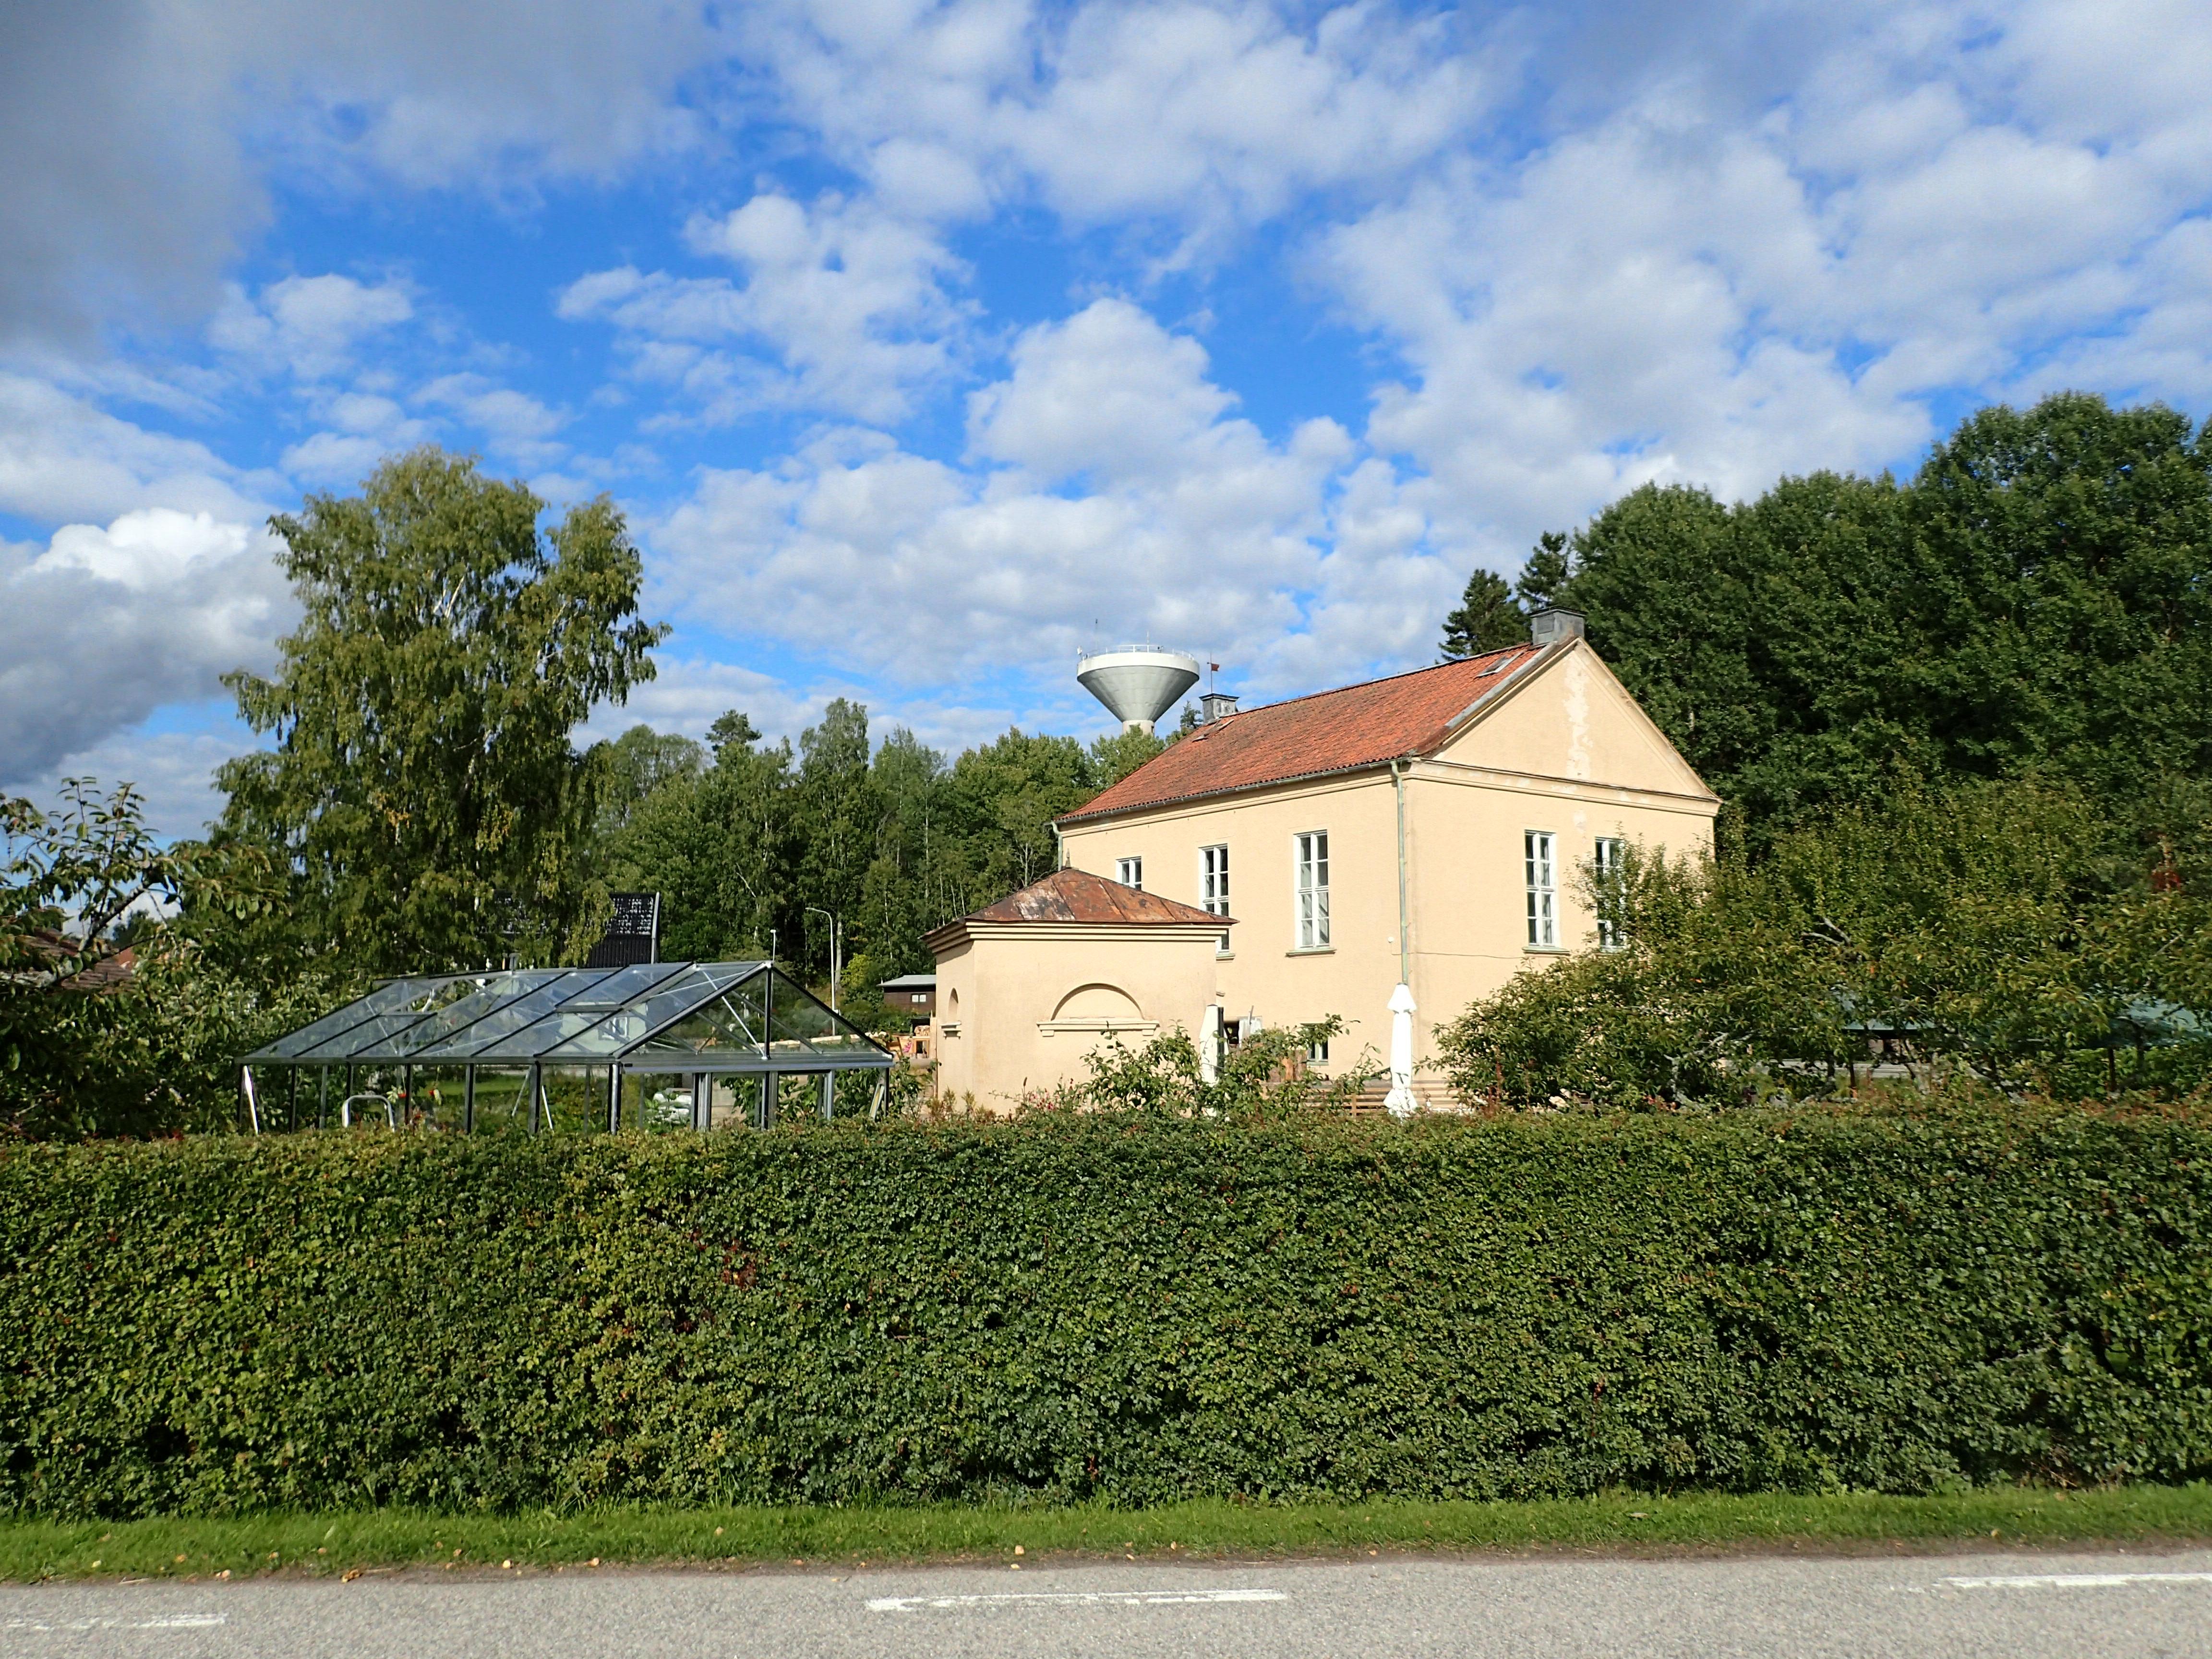 NORRQVARN HOTELL & KONFERENS - Prices & Hotel Reviews (Lyrestad, Sweden) - Tripadvisor